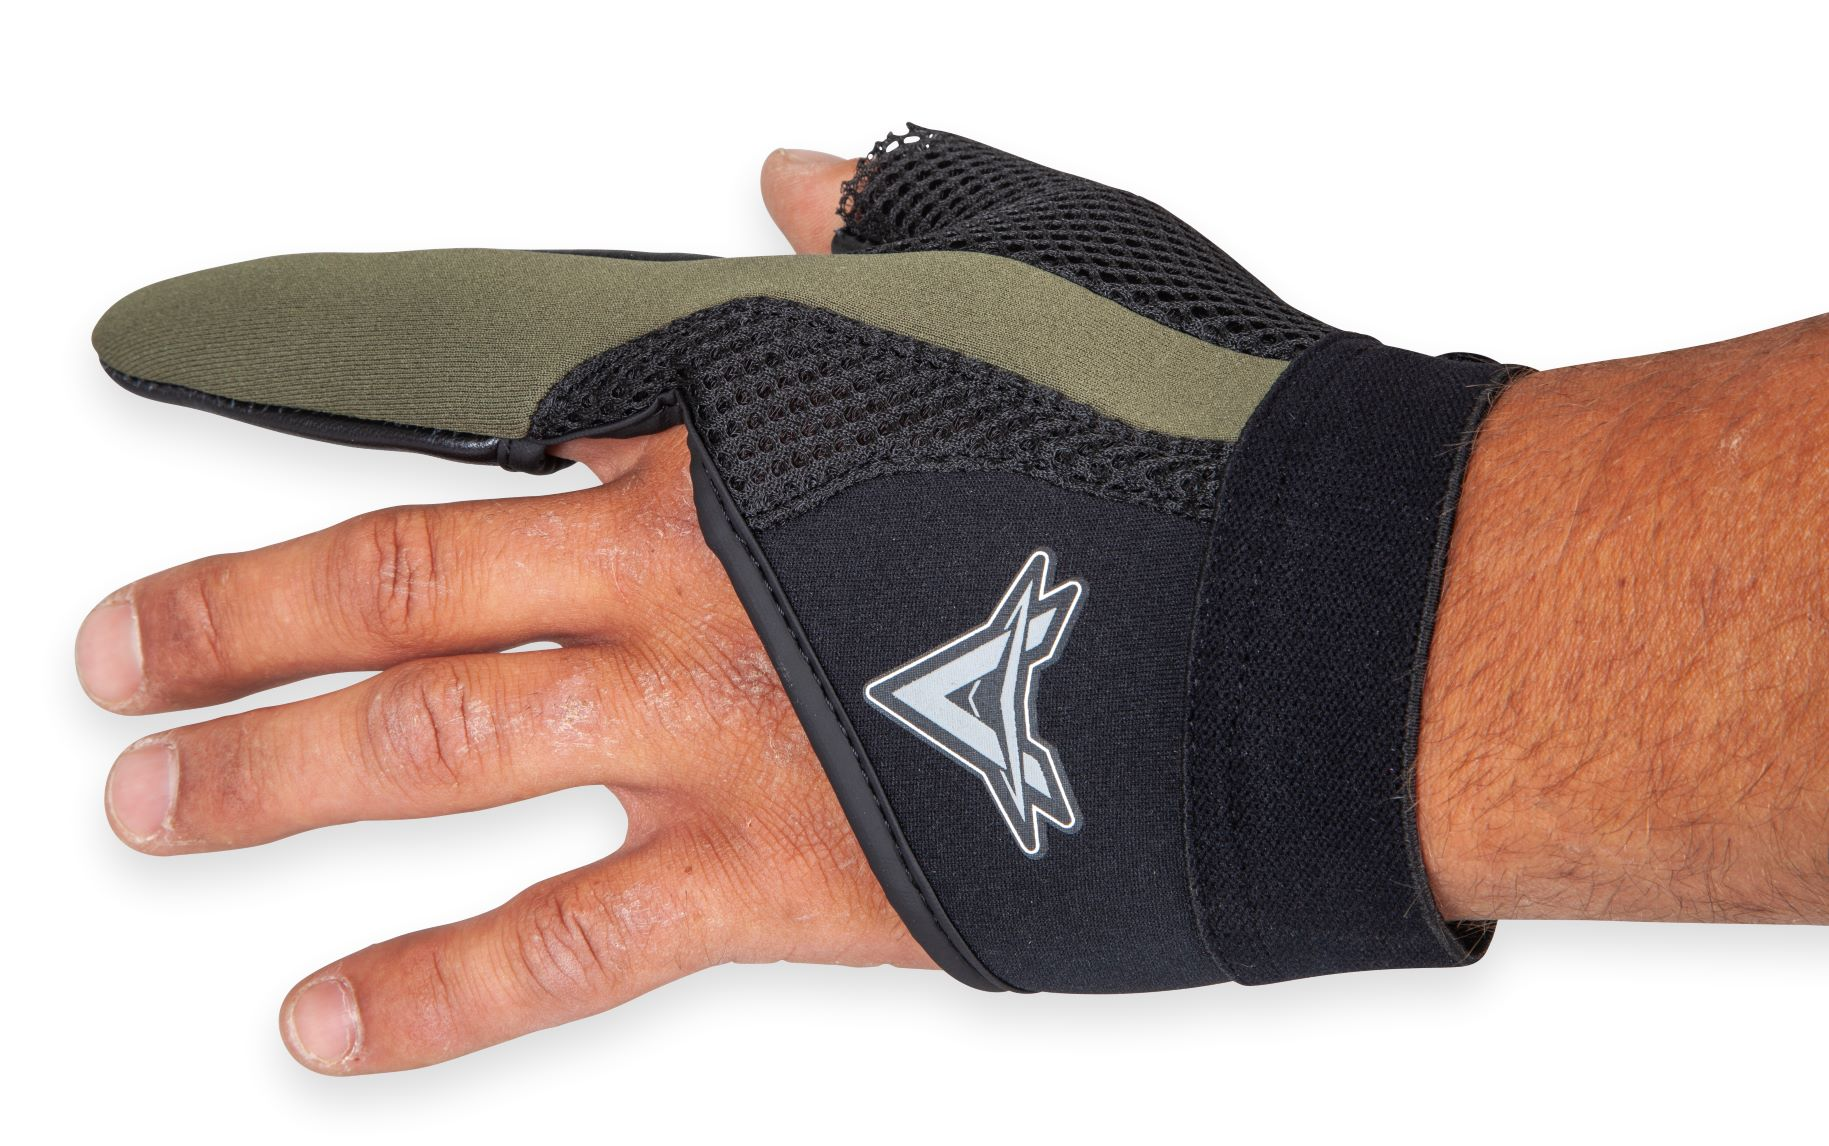 Anaconda rukavice Profi Casting Glove, levá, vel. XL